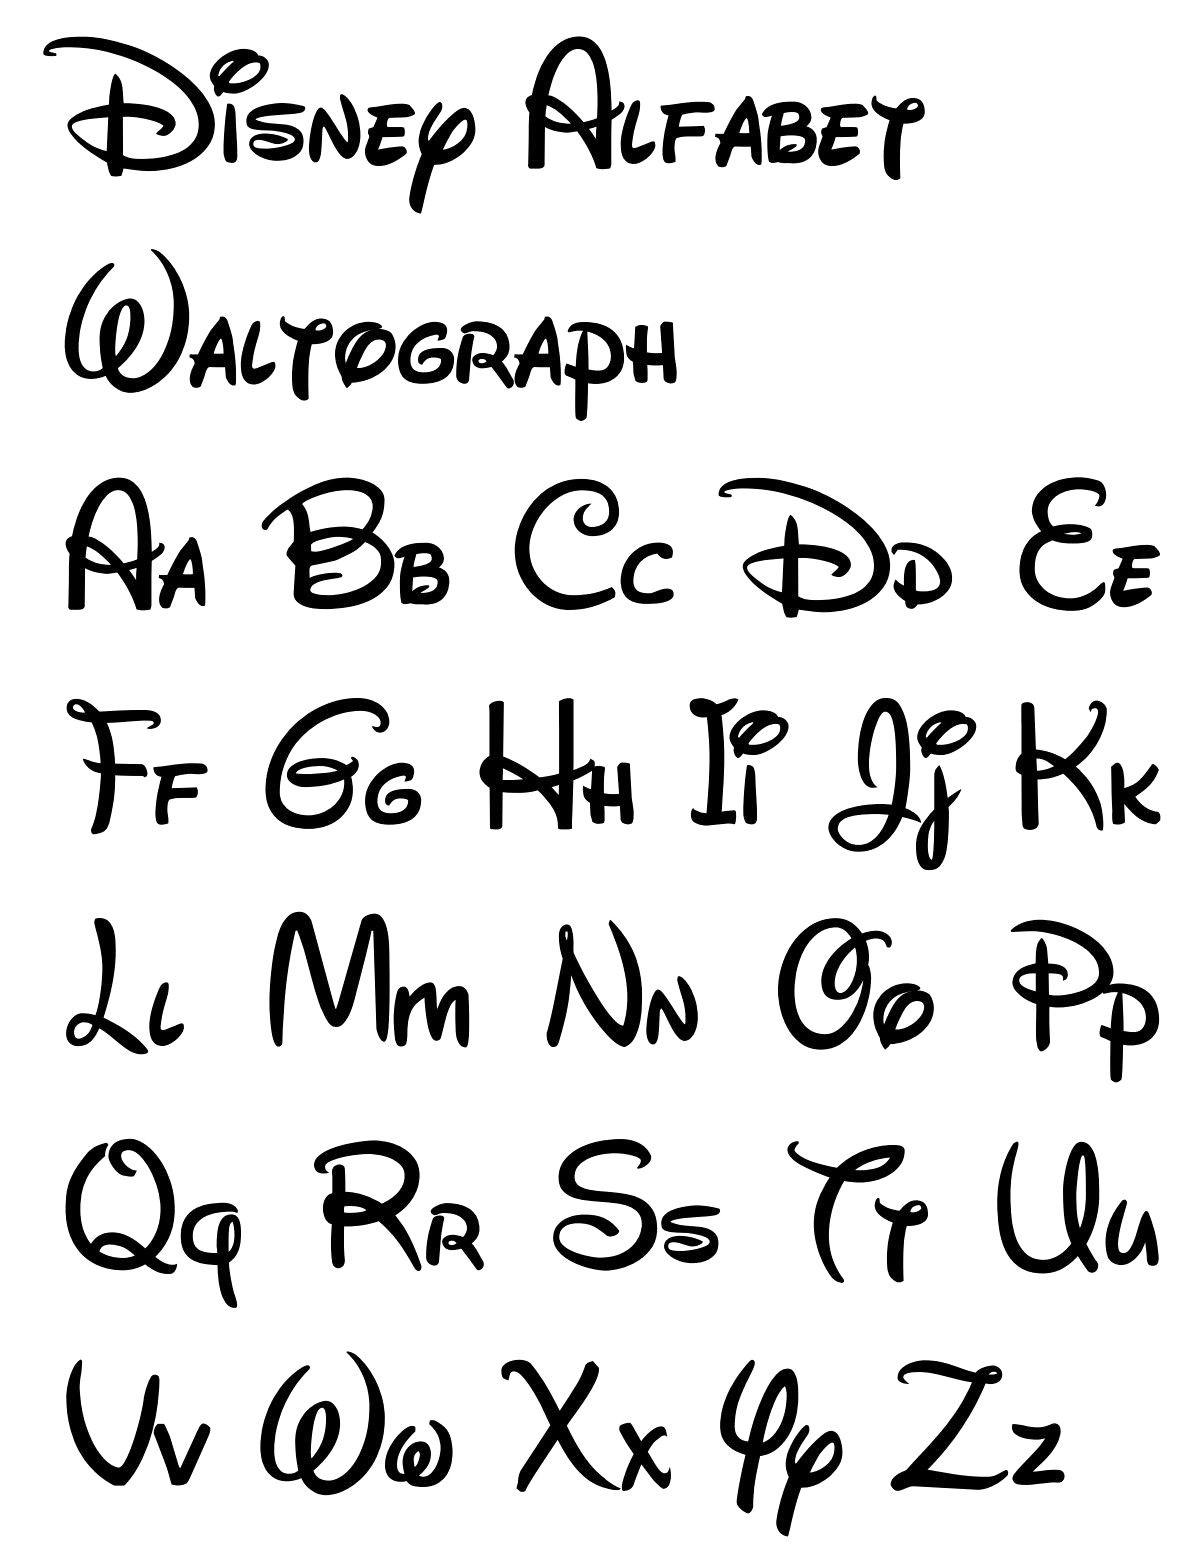 Free Printable Disney Letter Stencils   Disney   Pinterest - Free Printable Calligraphy Letter Stencils